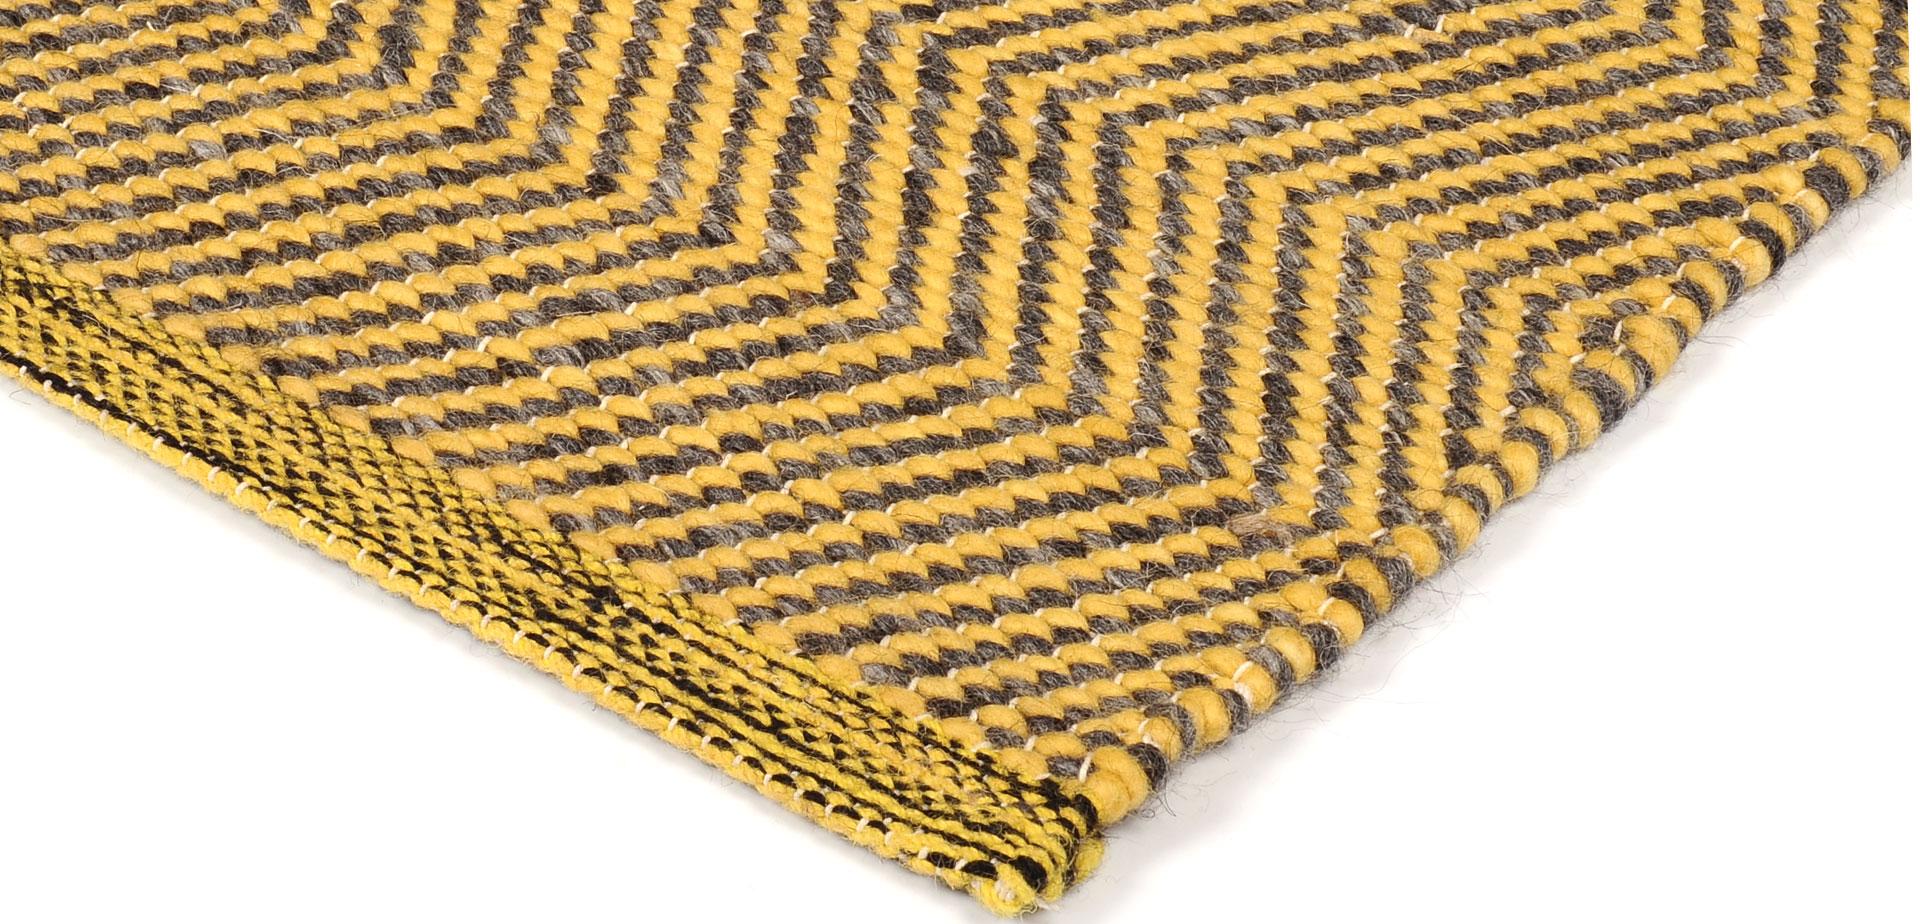 covor-3176-yellow-01.jpg